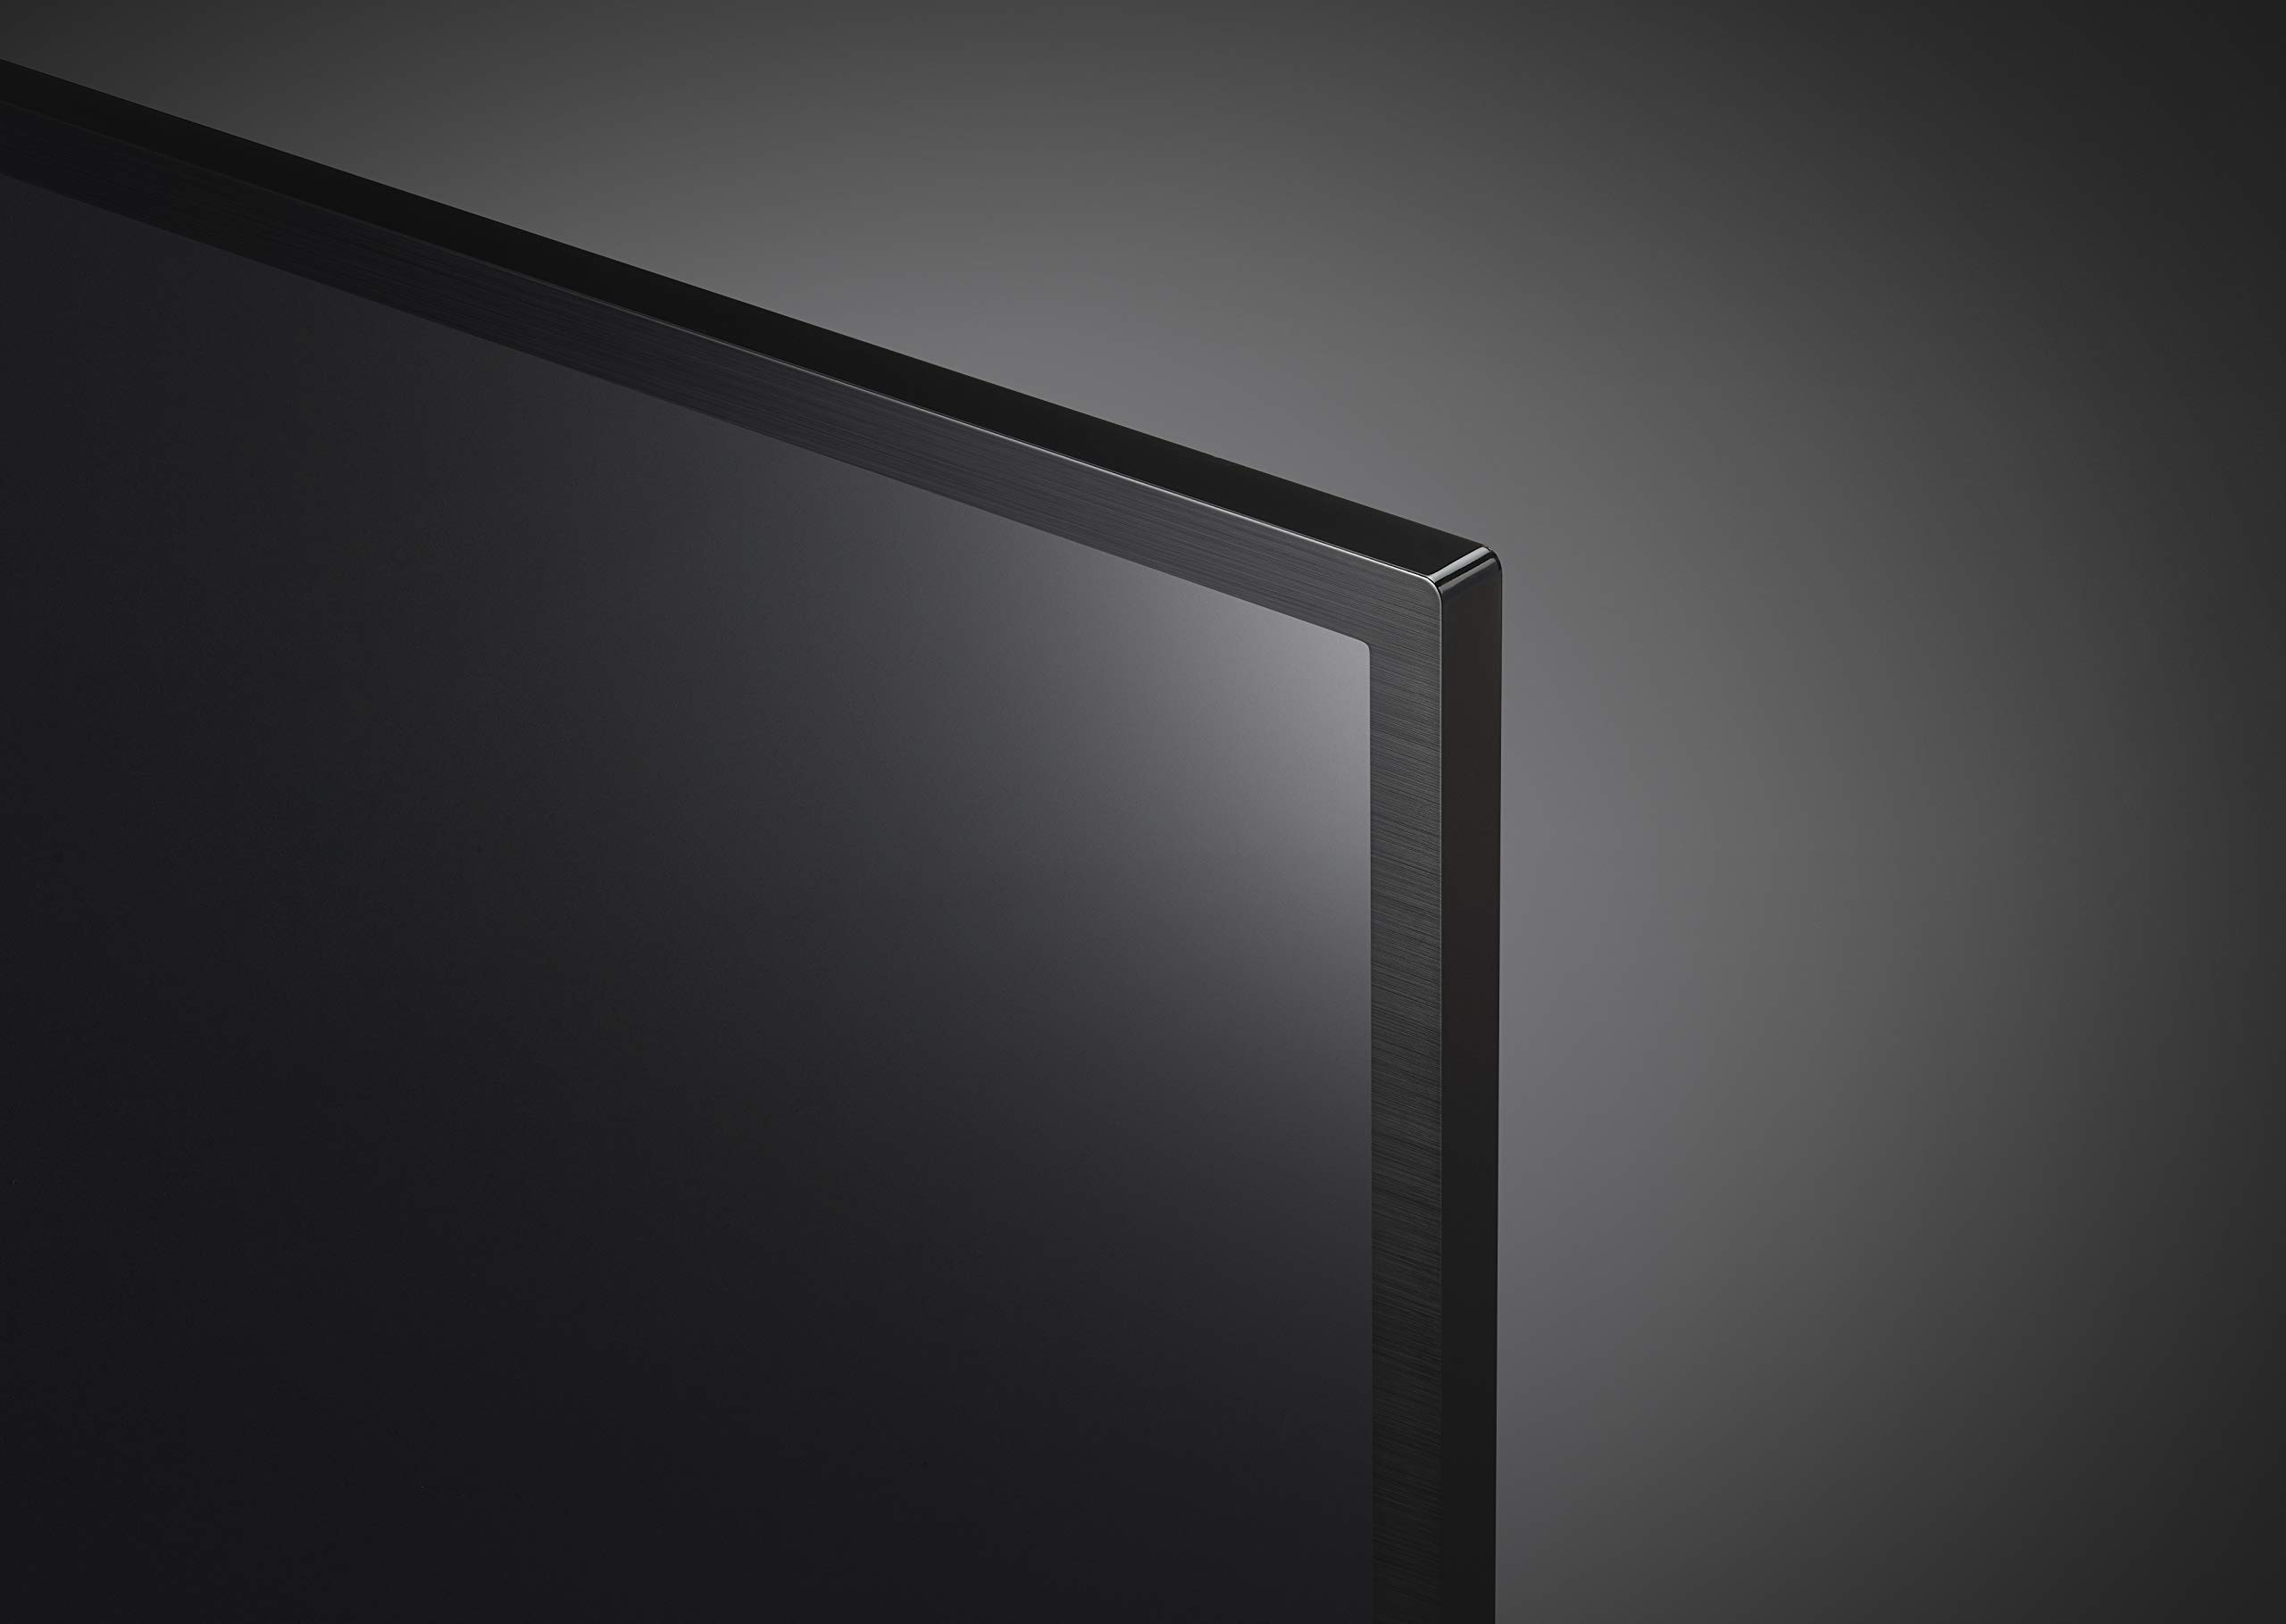 61UPYdOLiHL - LG Electronics 32LM630BPLA.AEK 32-Inch HD Ready Smart LED TV with Freeview Play - Ceramic Black Colour (2019 model)